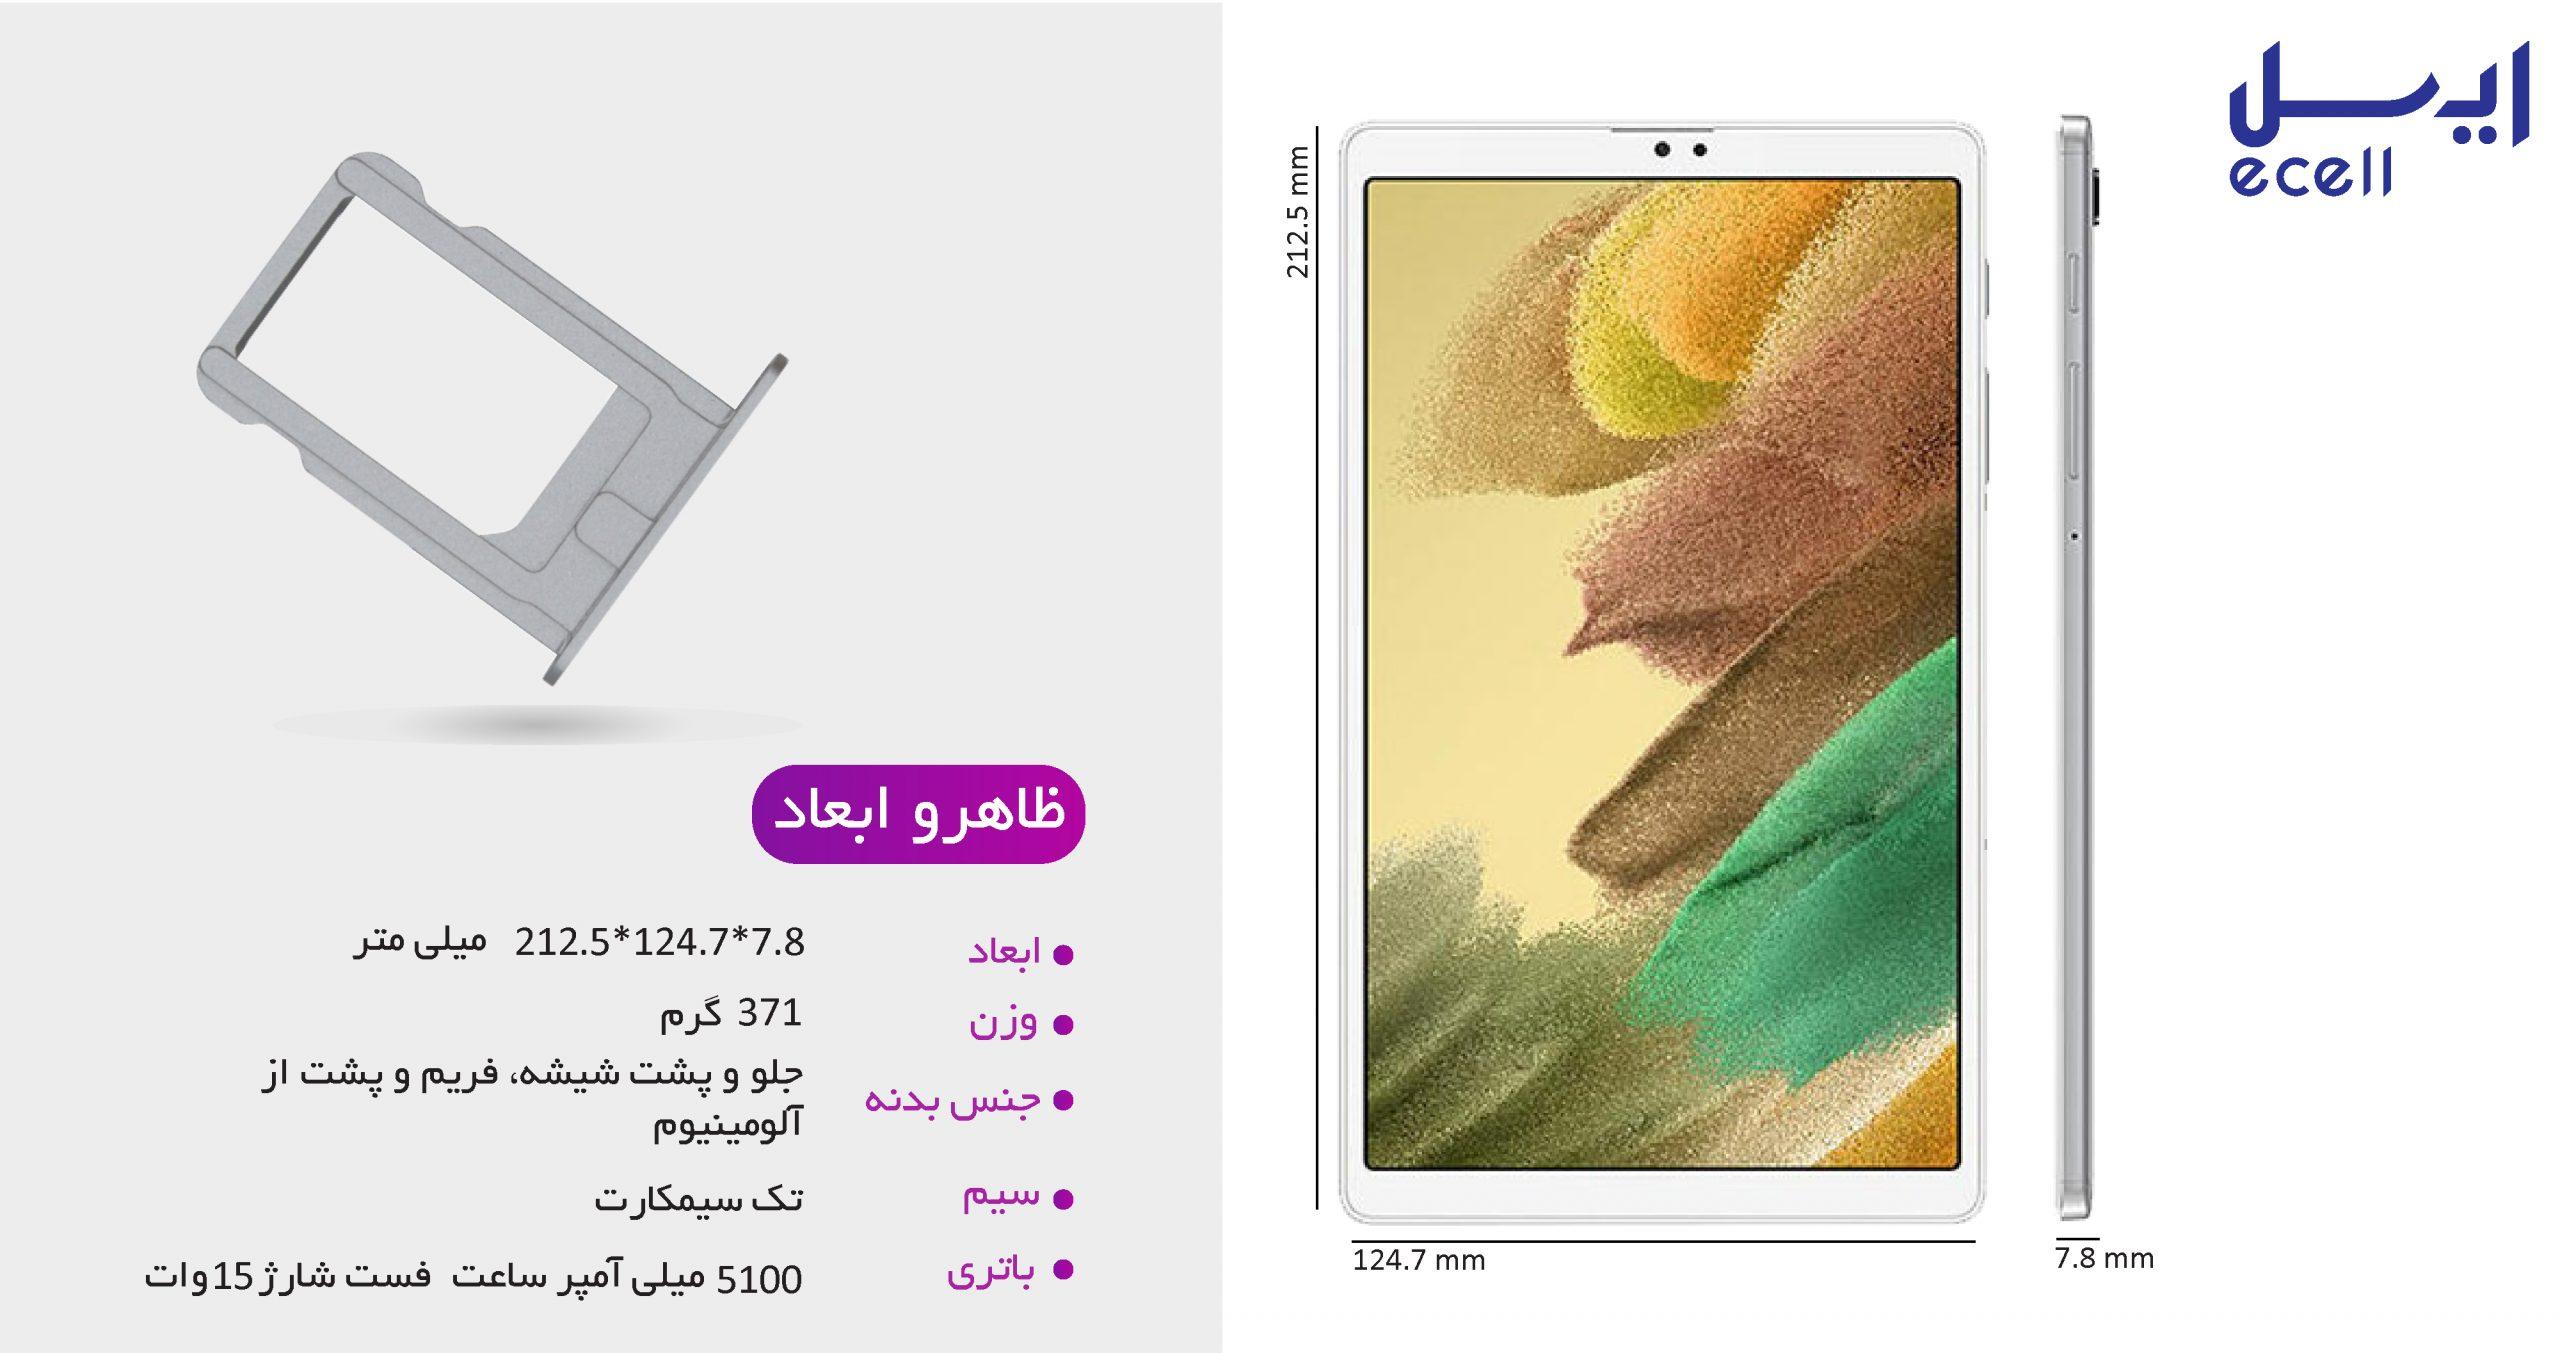 طراحی ظاهری تبلت سامسونگ Galaxy Tab A7 Lite T225